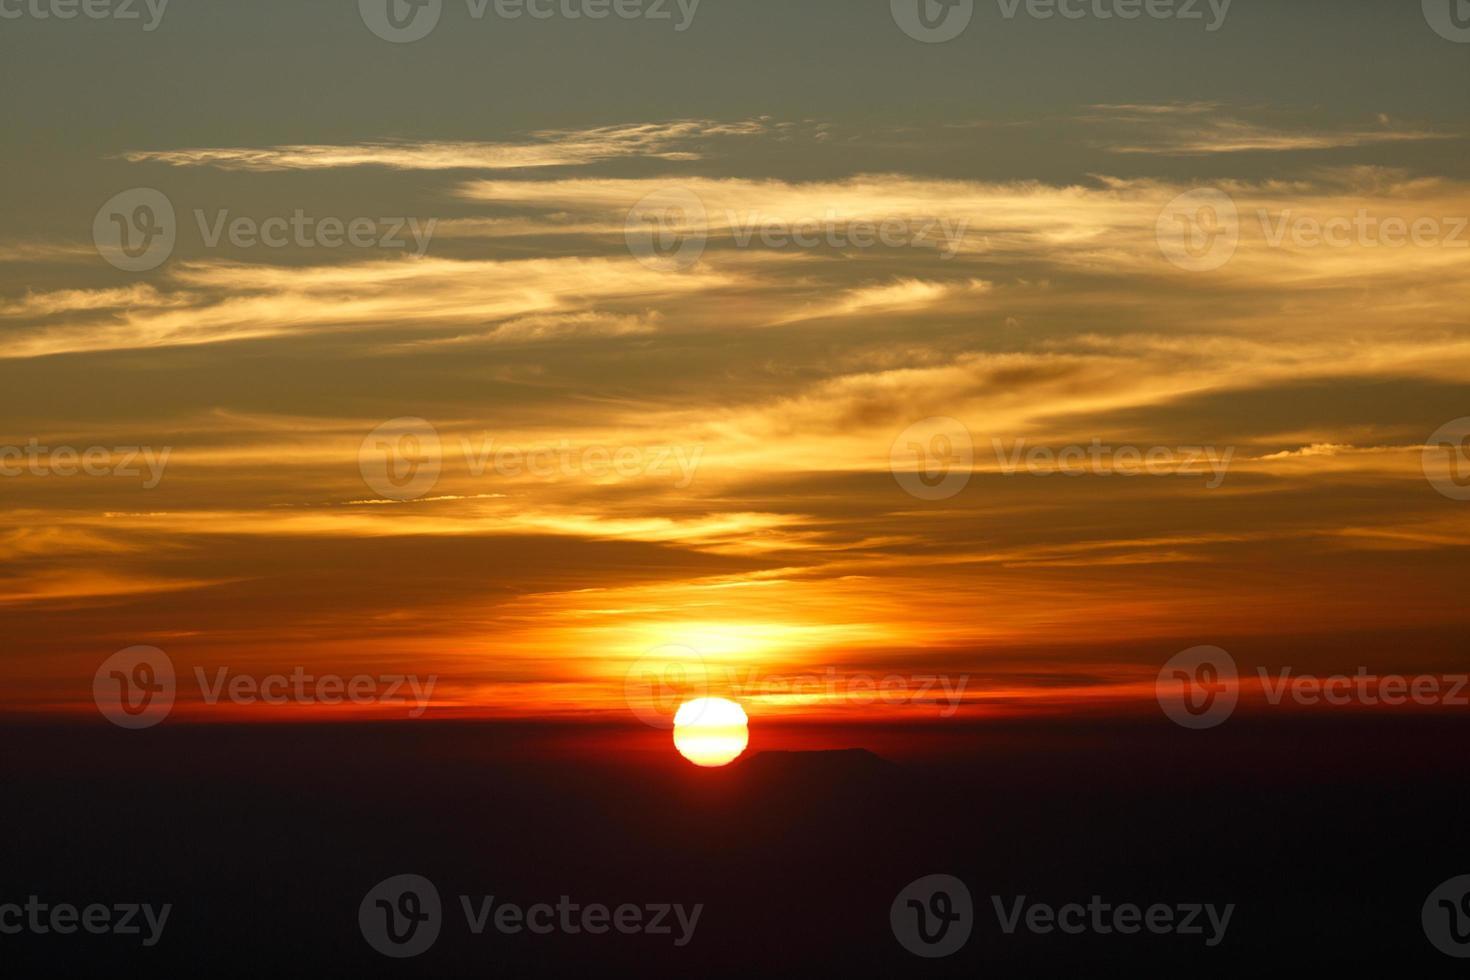 alba, sfondo del cielo al tramonto. foto